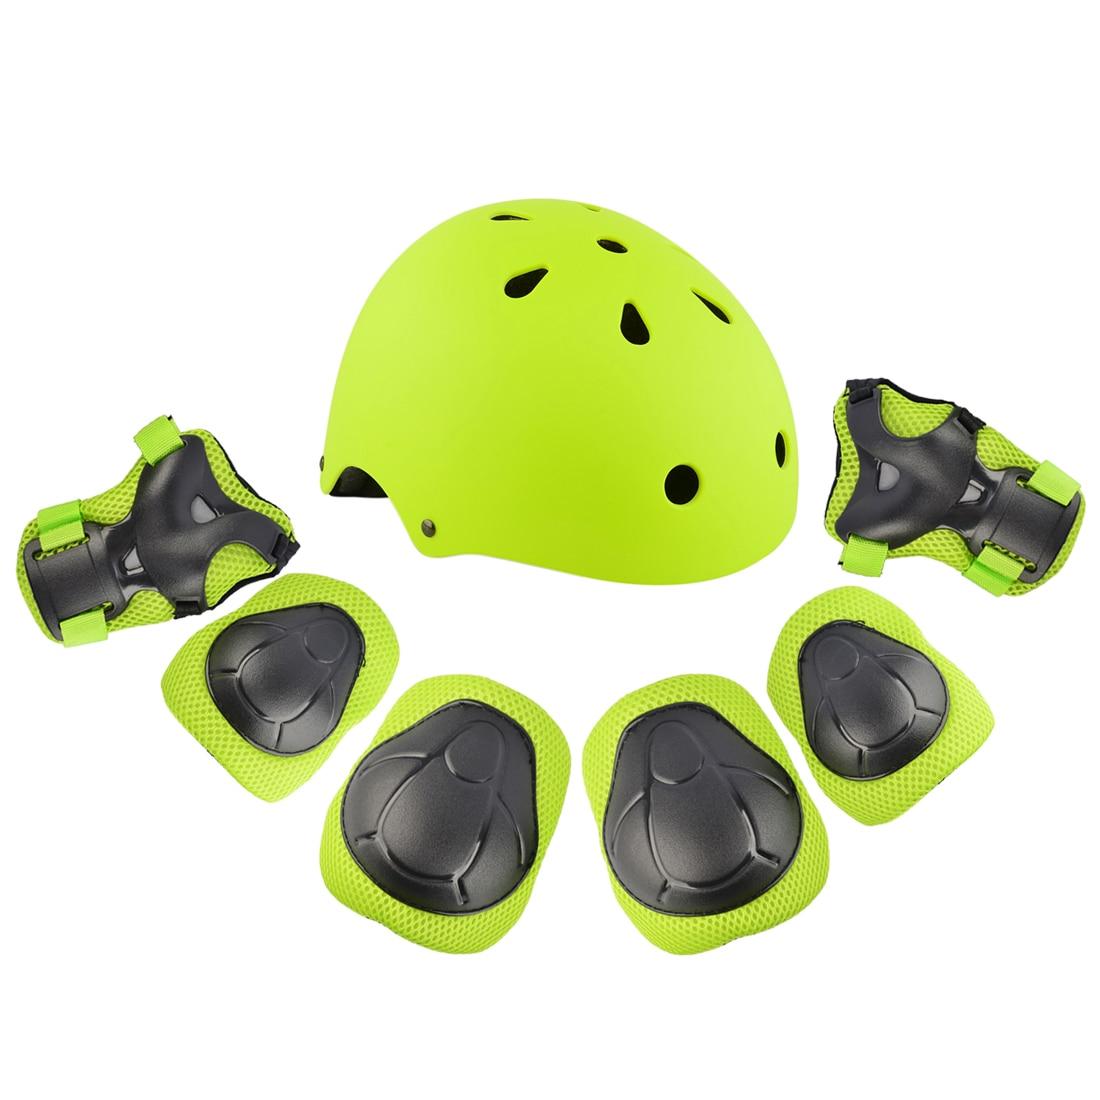 7Pcs Child Adult Skating Board Safety Helmet Set Knee Elbow Wrist Pad Protector